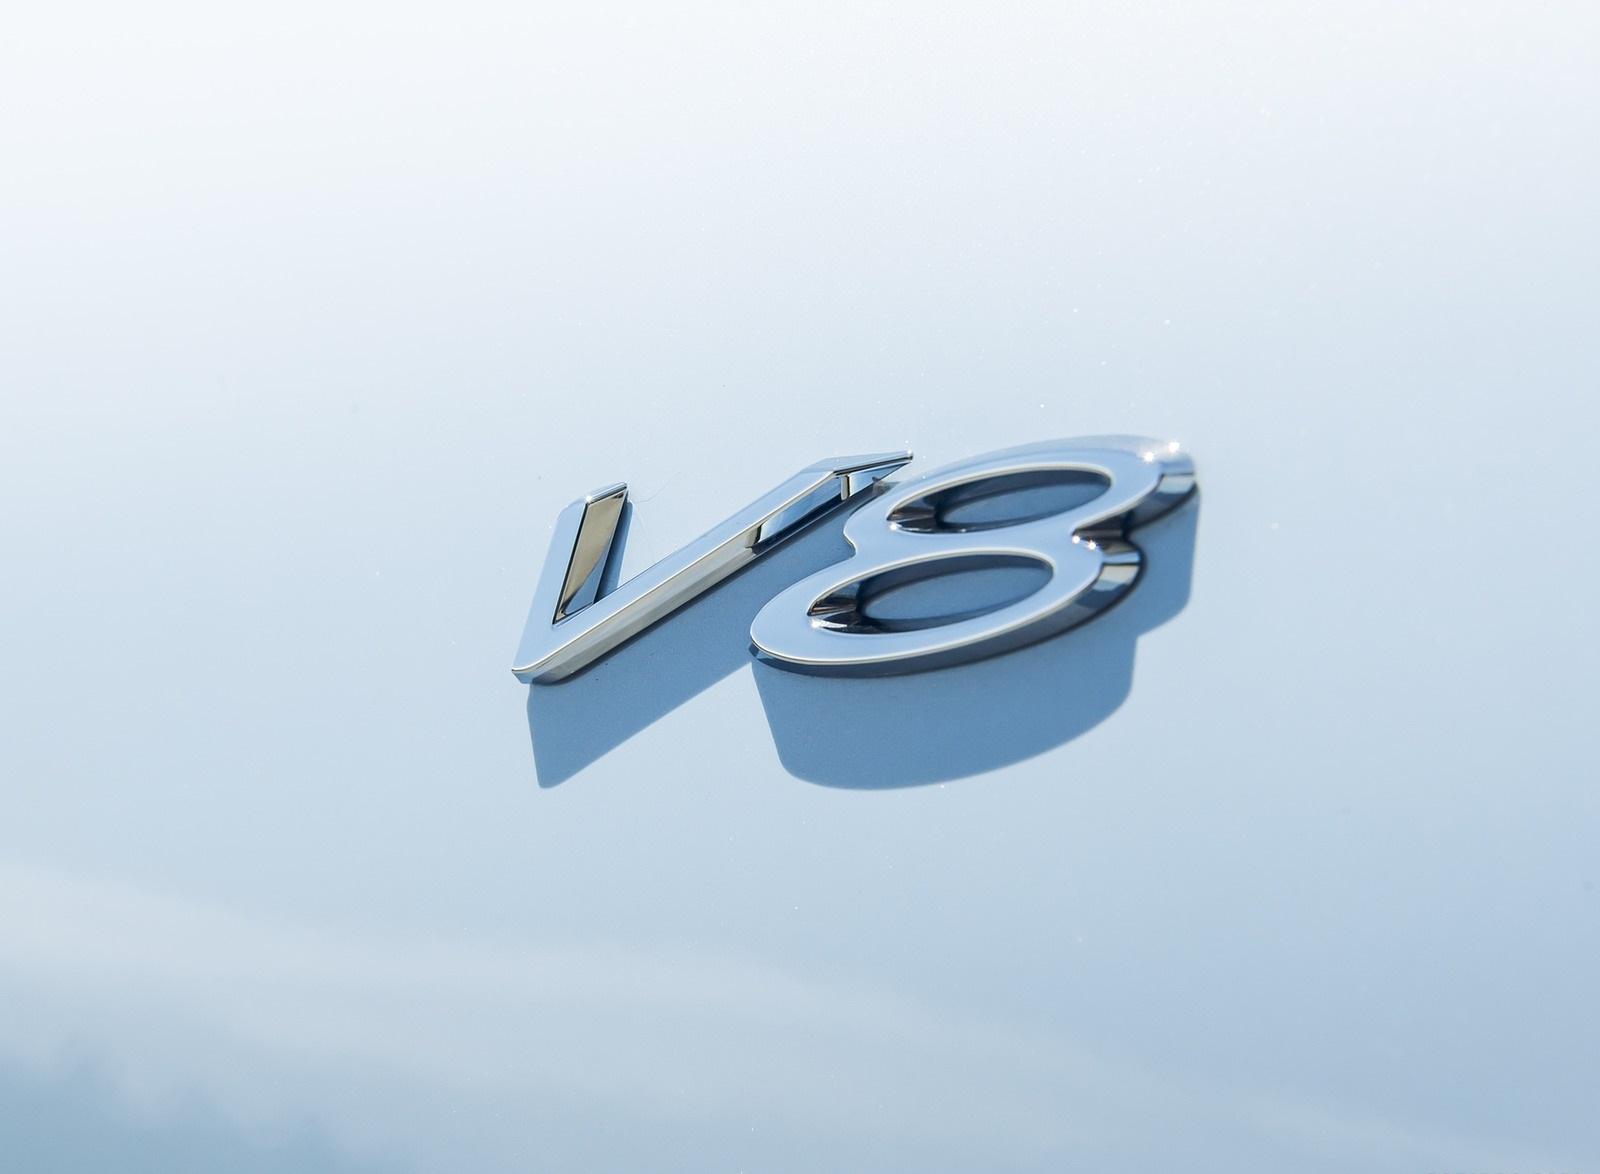 2020 Bentley Continental GT V8 Convertible Badge Wallpapers (15)